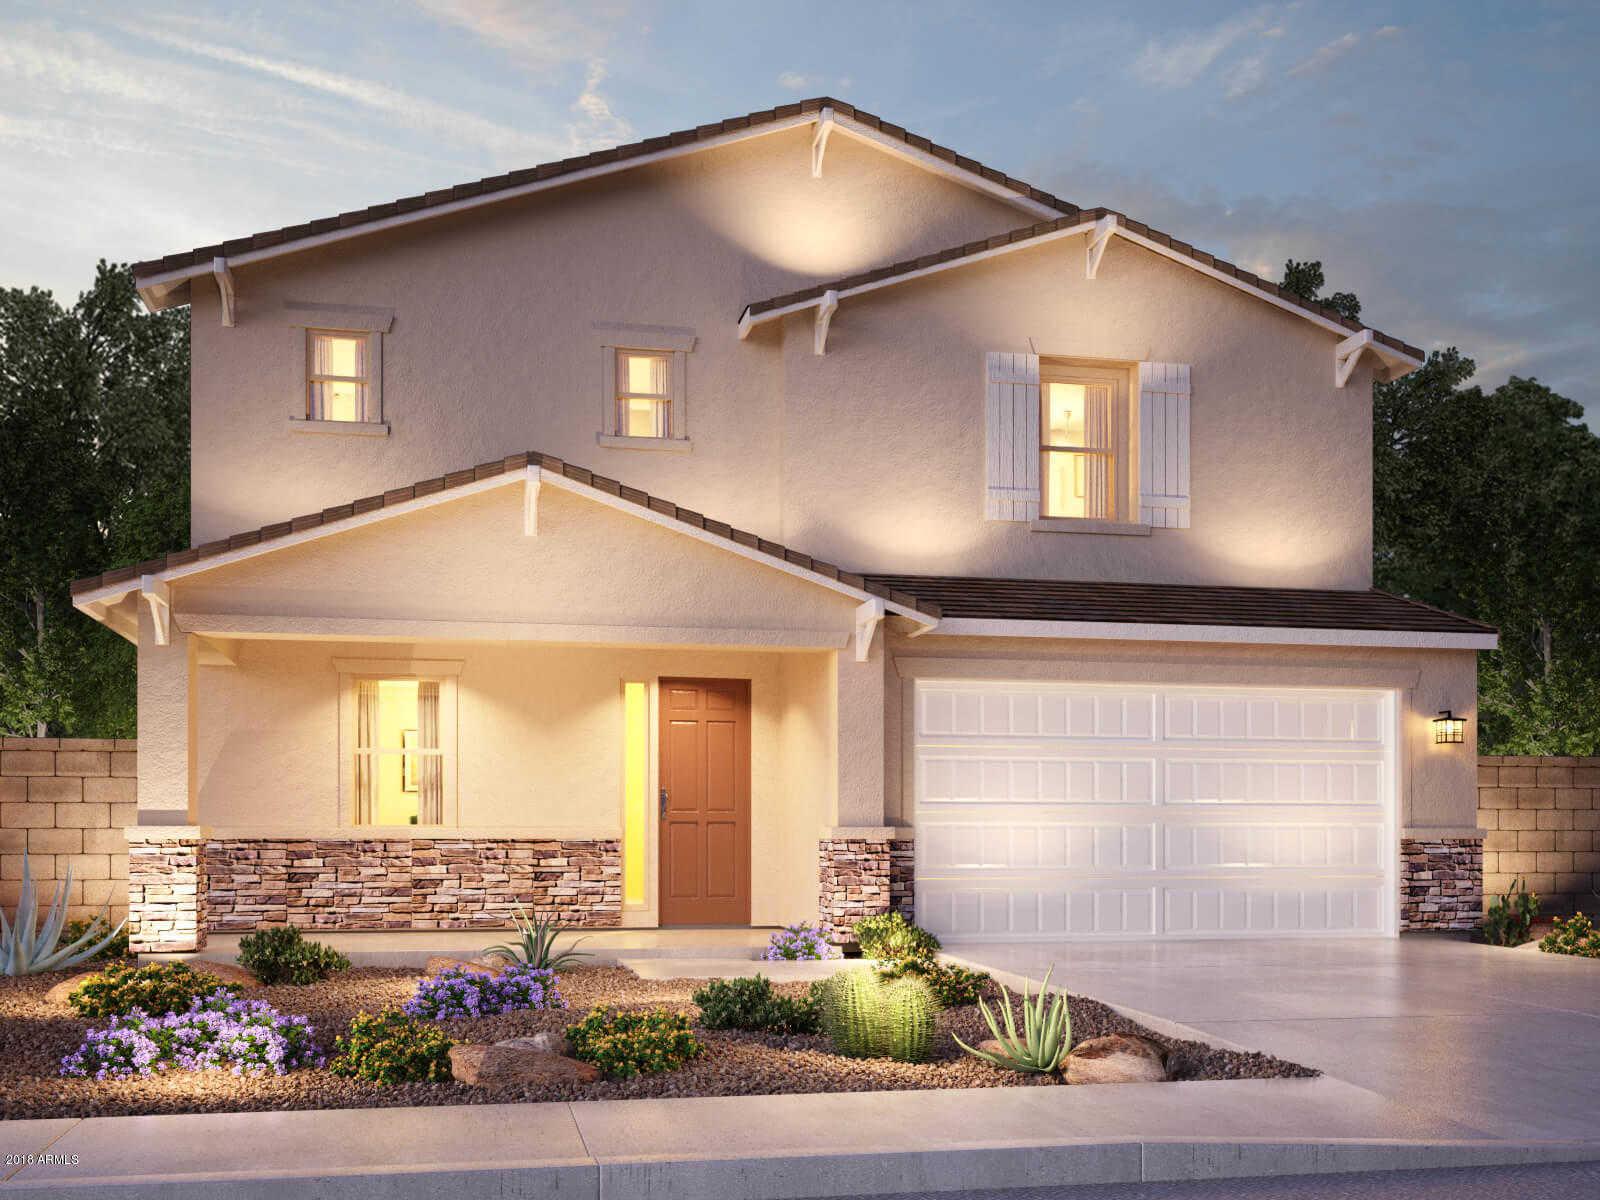 $344,995 - 5Br/3Ba - Home for Sale in Marbella Ranch Parcel 1, Glendale